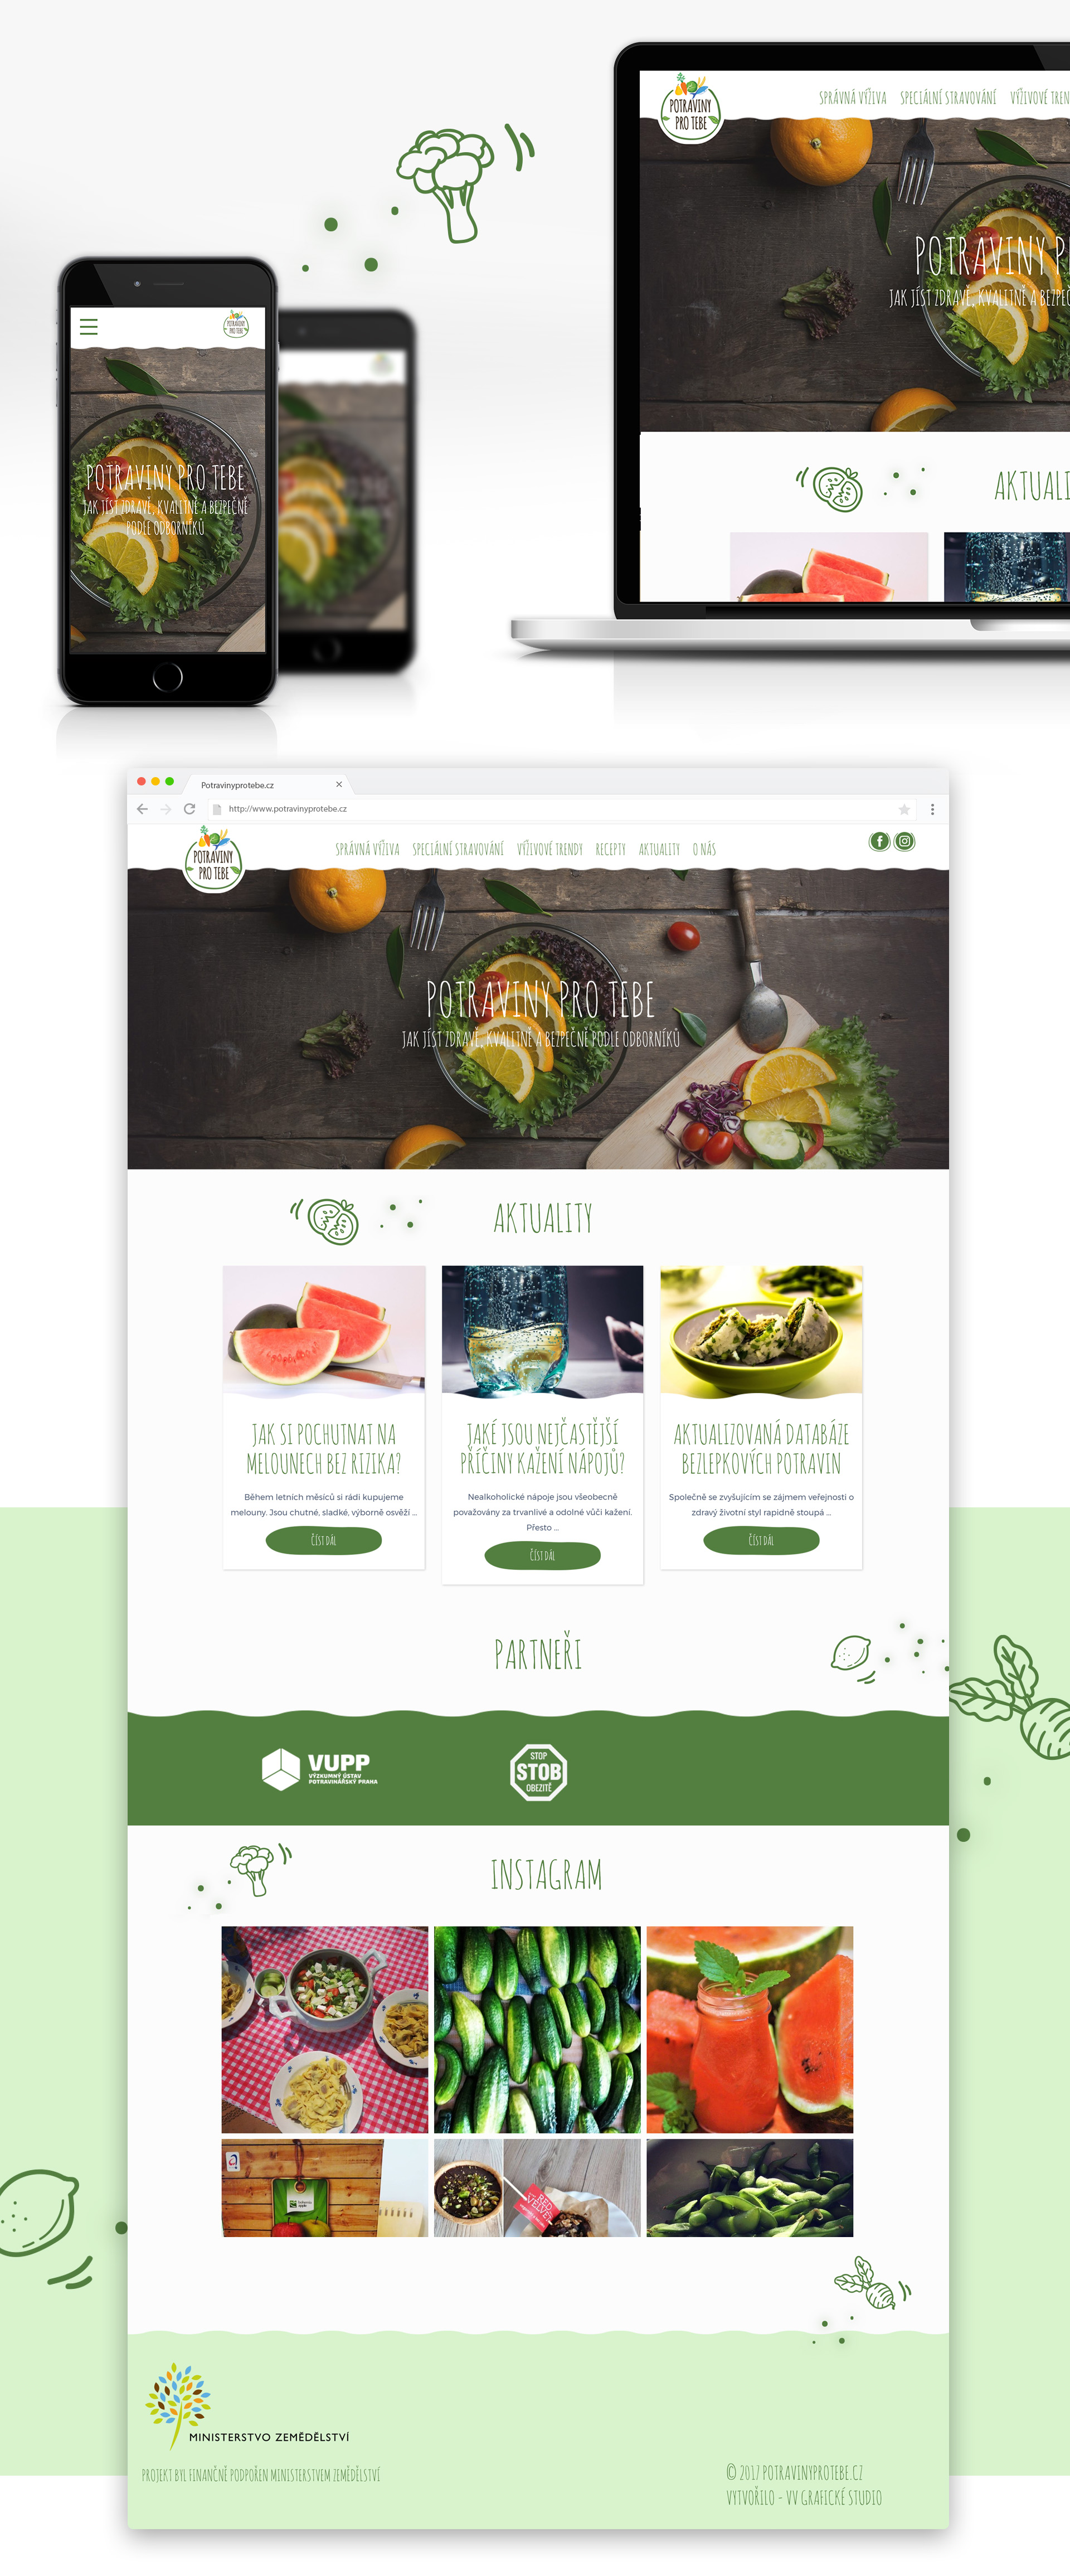 Blog o zdravé výživě - Potravinyprotebe.cz | VV grafické studio